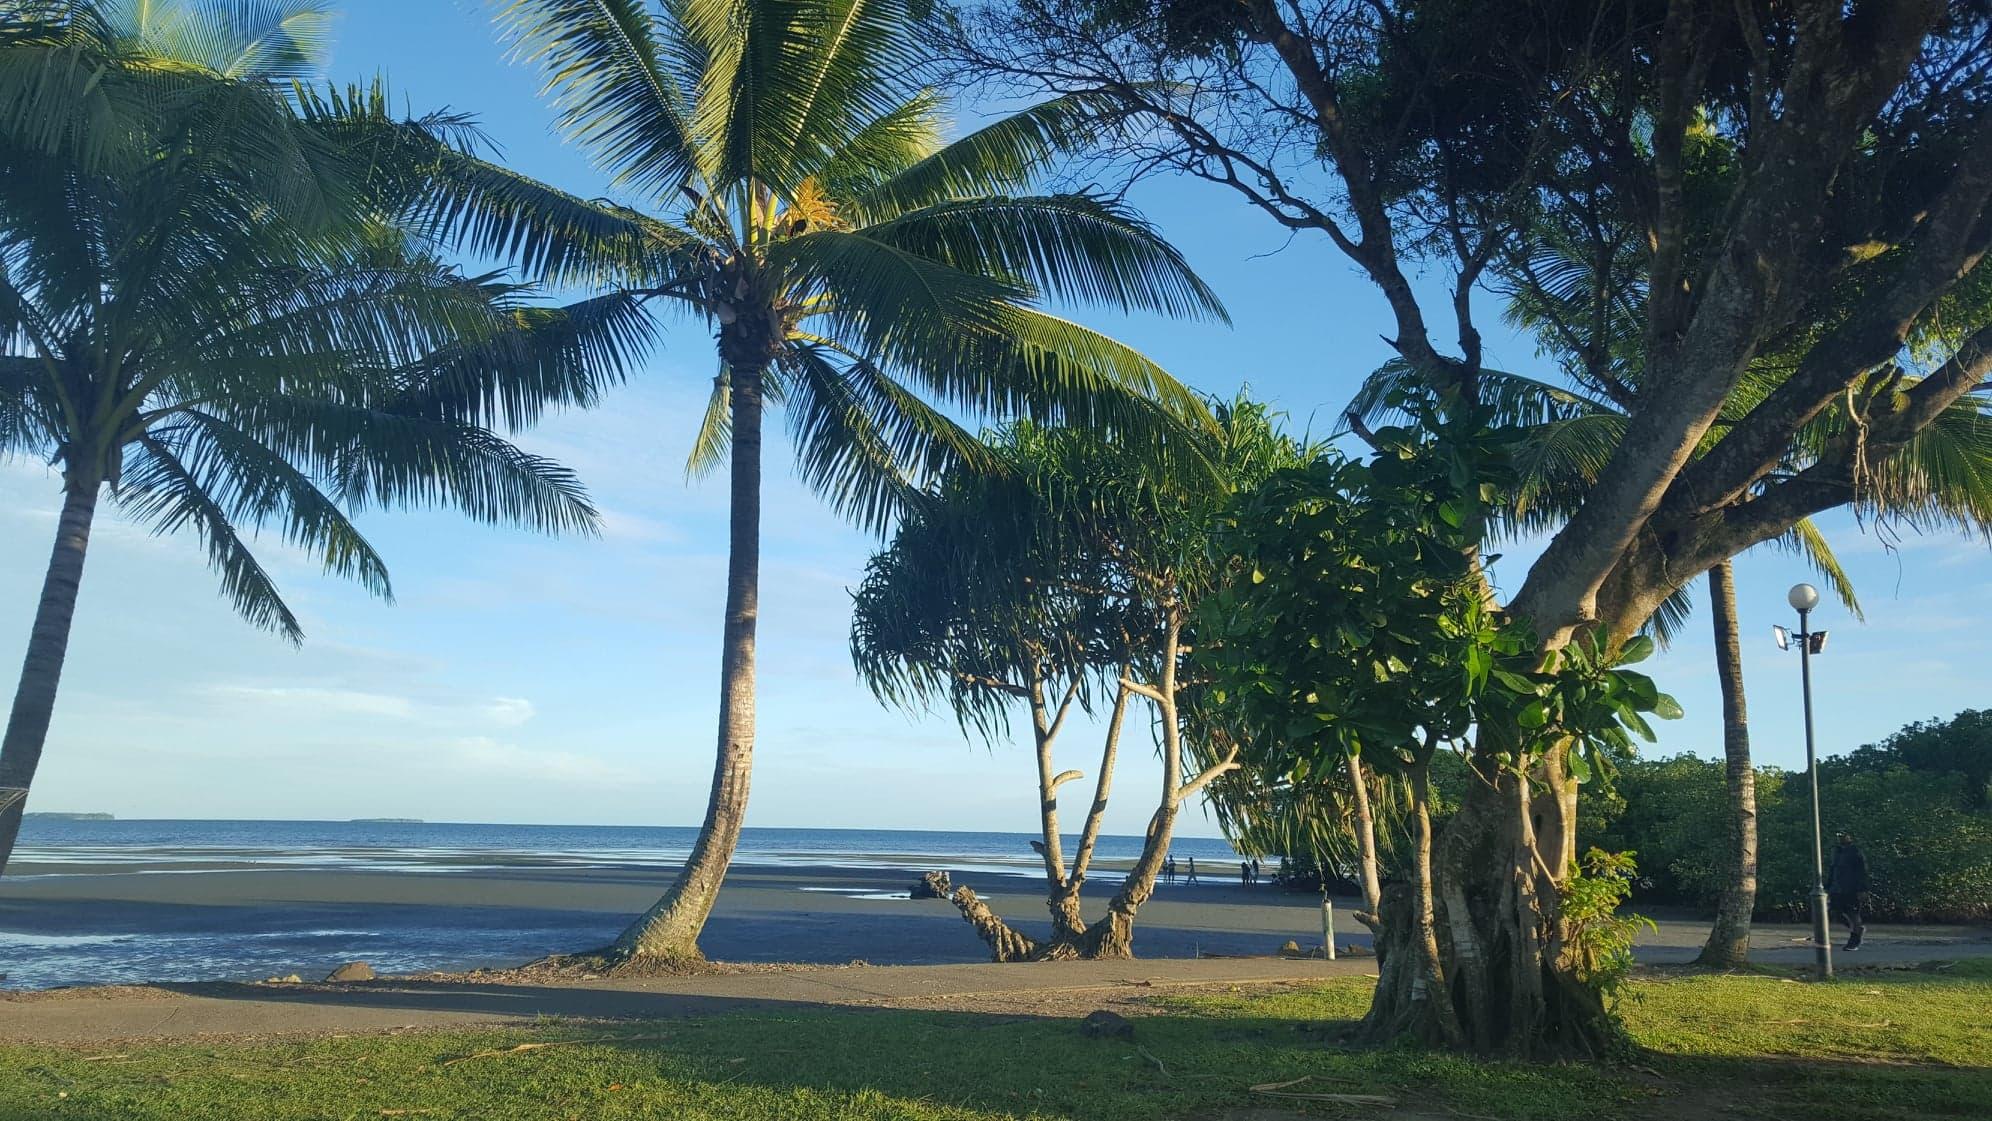 Beautiful beaches in the South Seas. Photo credit Hery Ramambasoa.